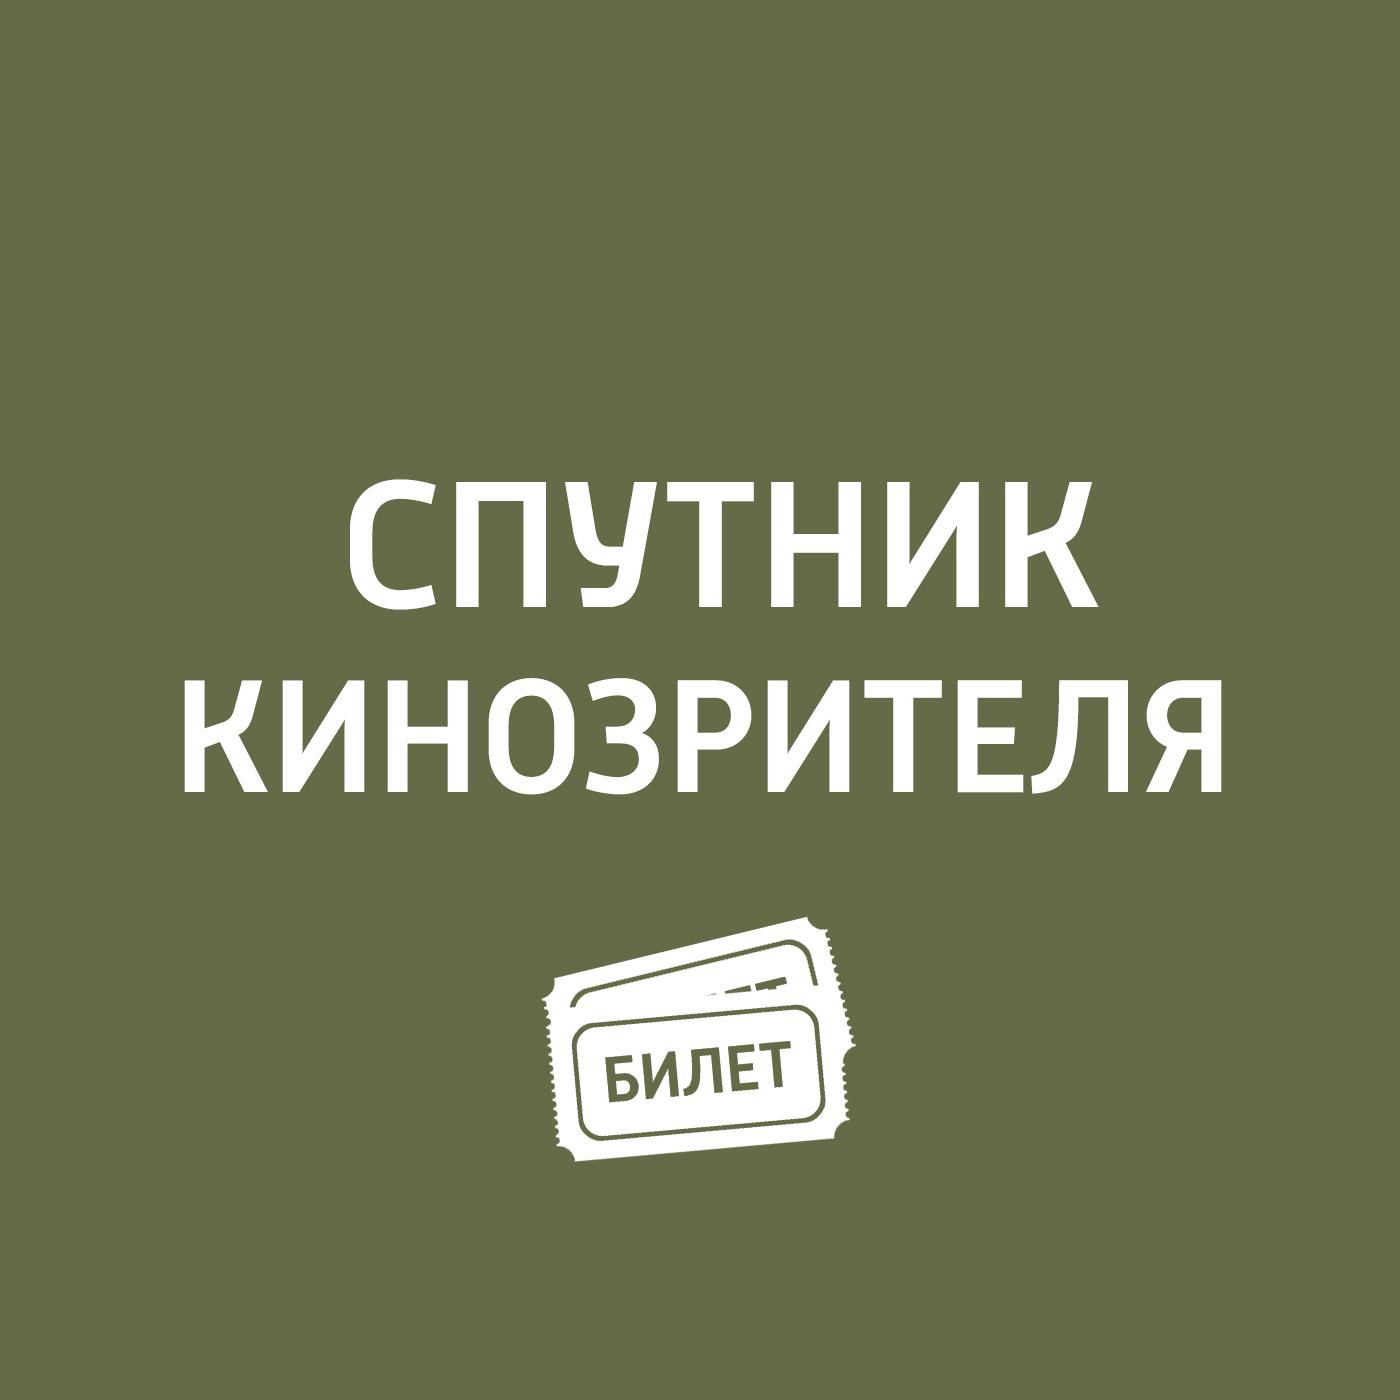 Антон Долин Mamma Mia! 2; Слендермен; My Generation mamma mia taipei